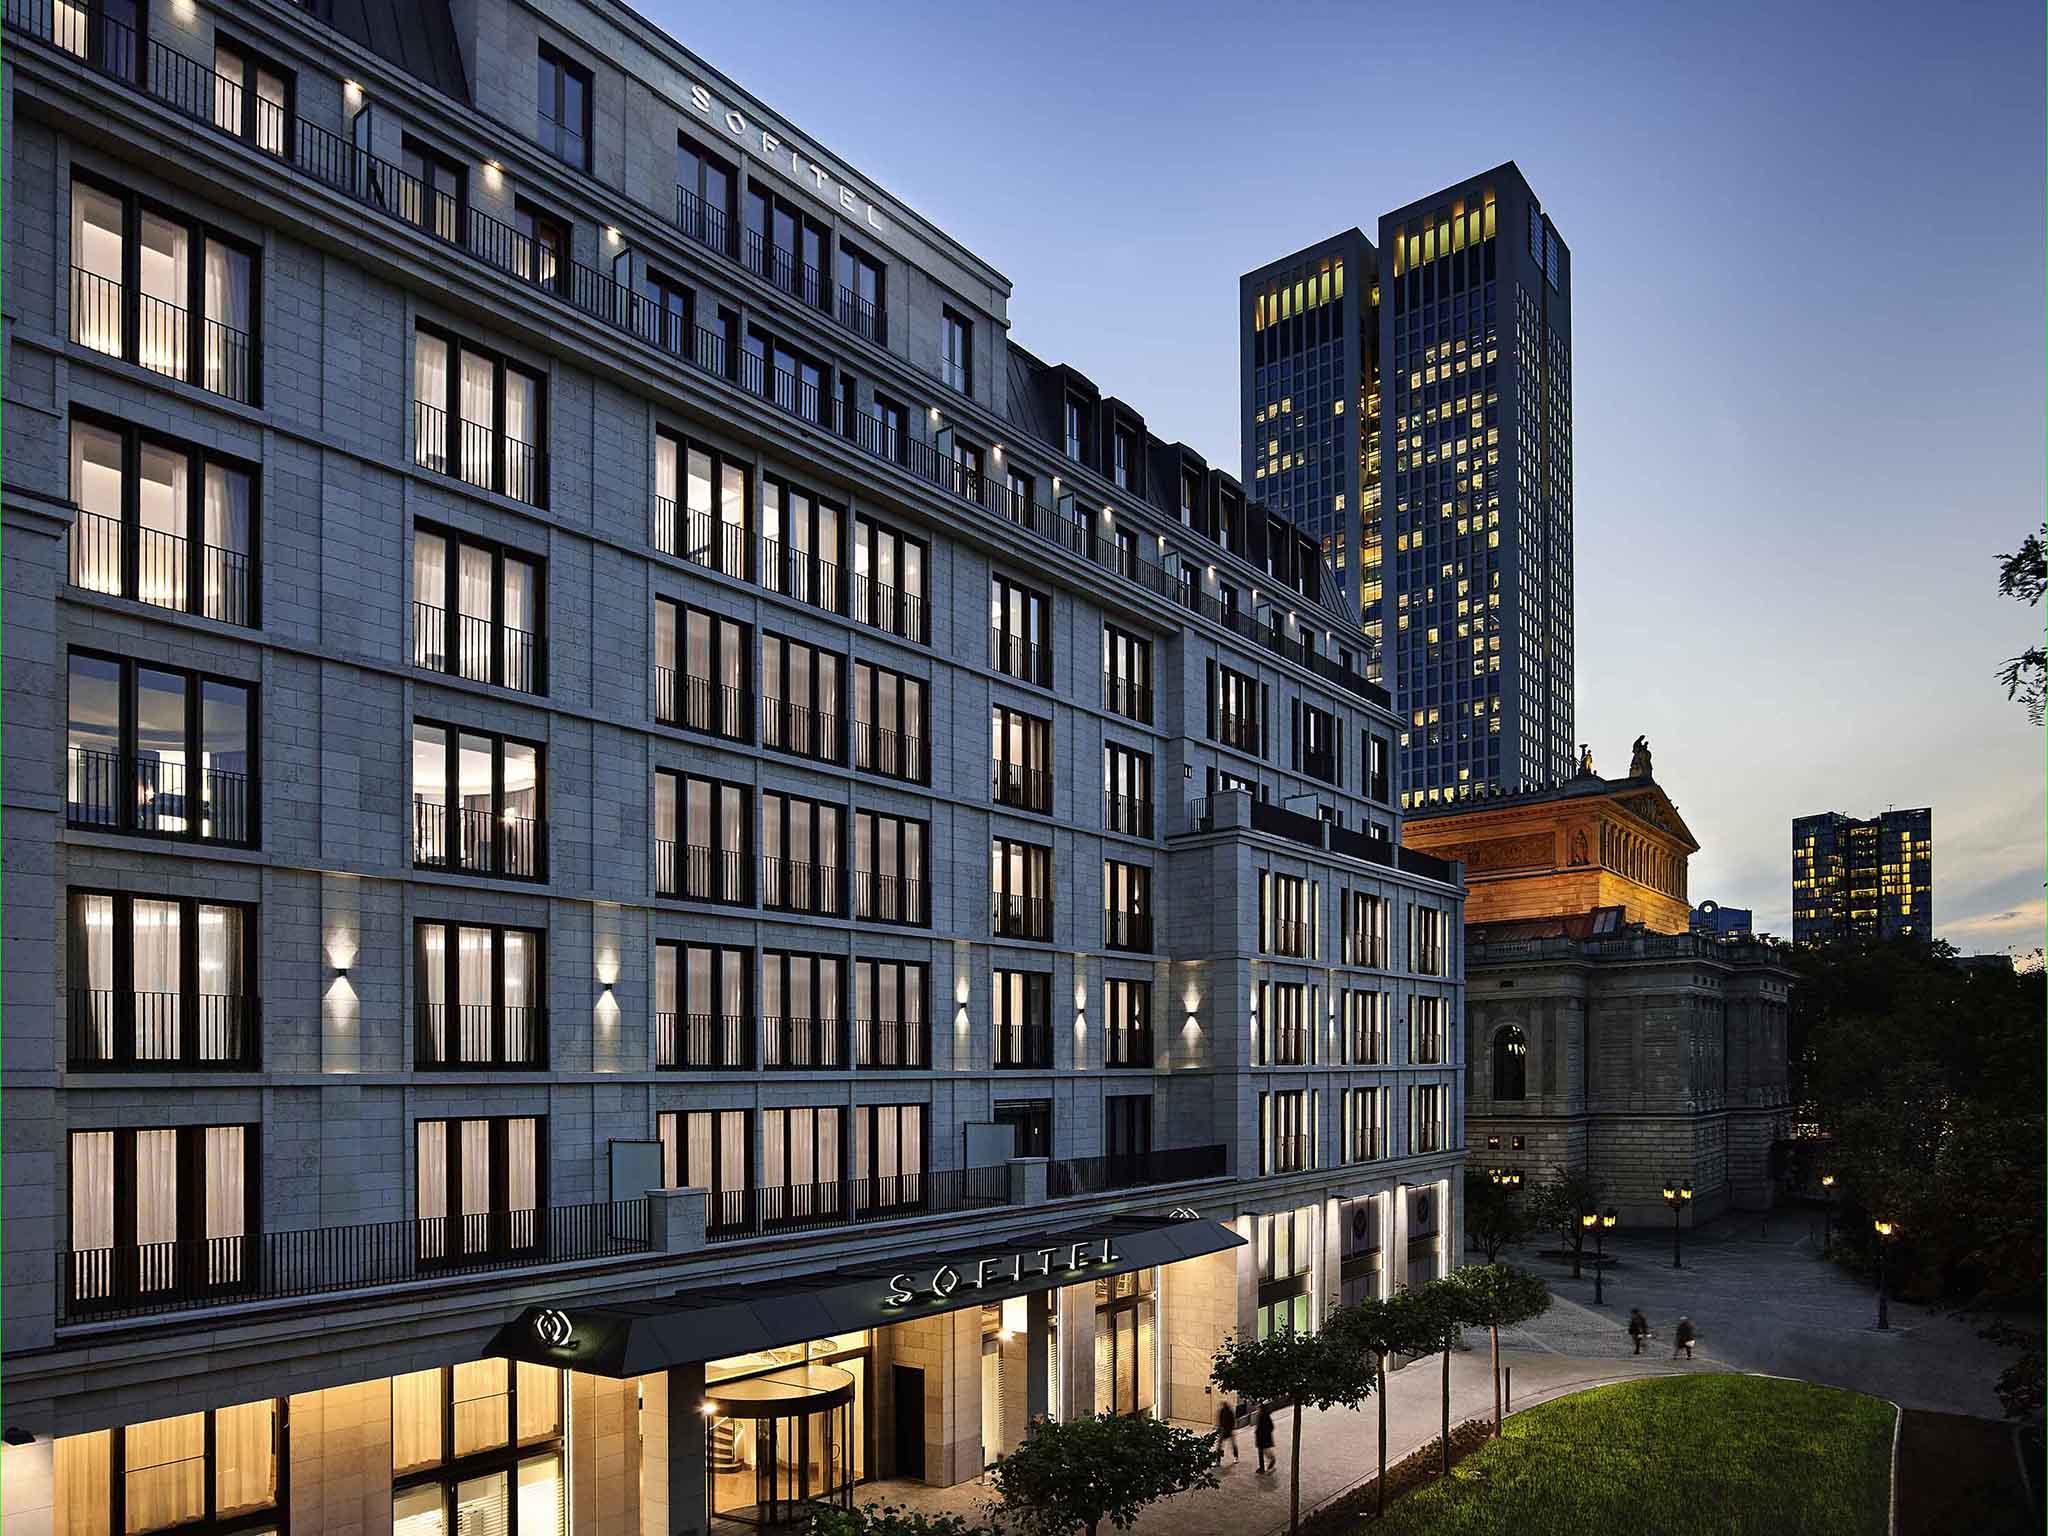 Hotel - Sofitel Frankfurt Opera